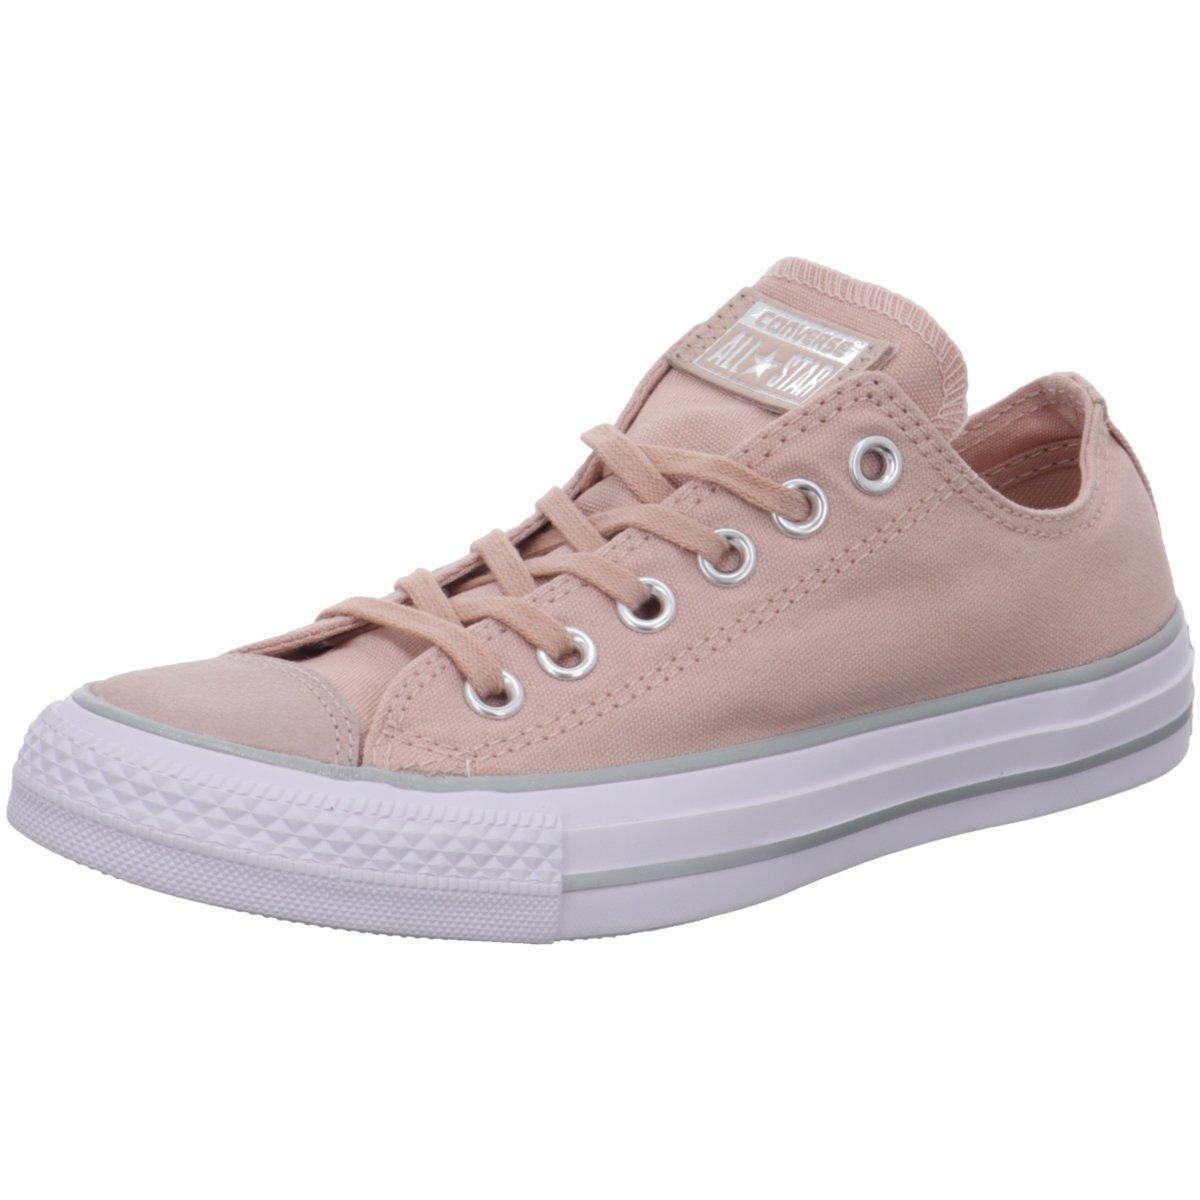 7eee9269179d5 ... taylor all star baby chucks first star pink rosa lauflernschuhe 614cf  78b30  wholesale das bild wird geladen neu converse damen sneaker canvas  unisex ...